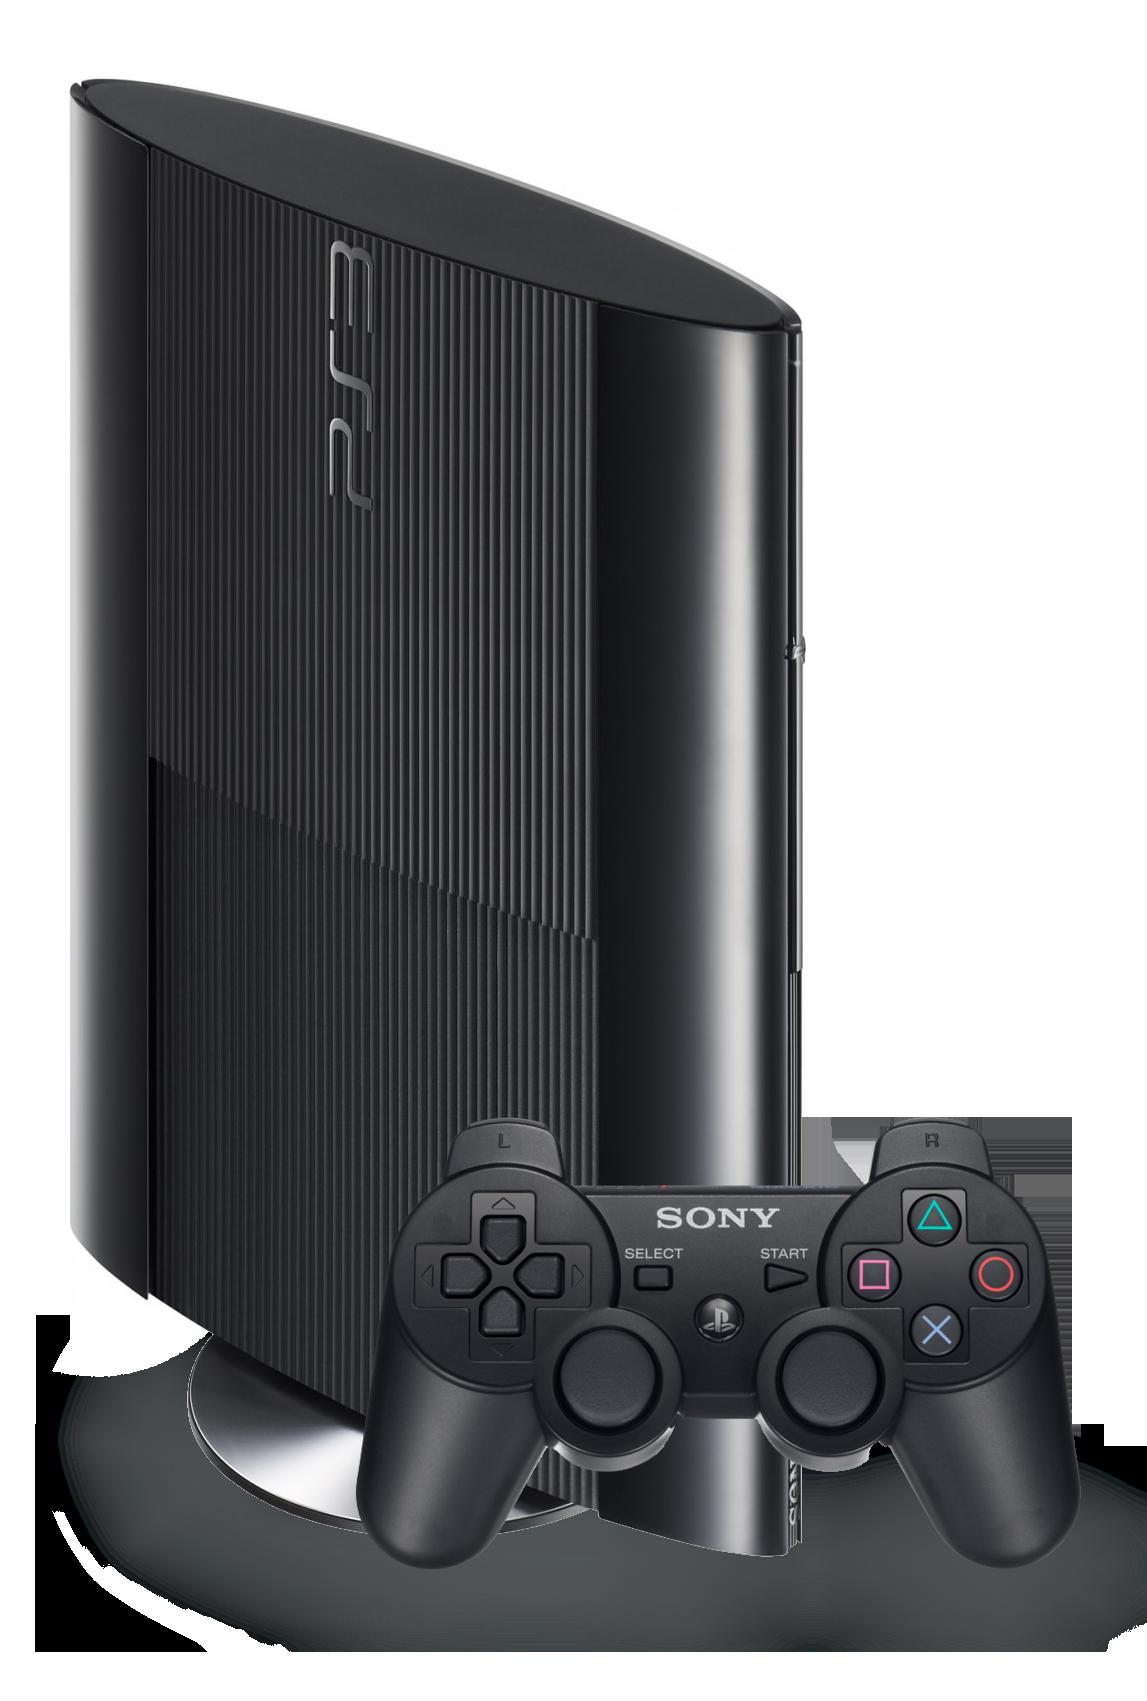 Super Slim Playstation 3 : Playstation sonic wiki fandom powered by wikia